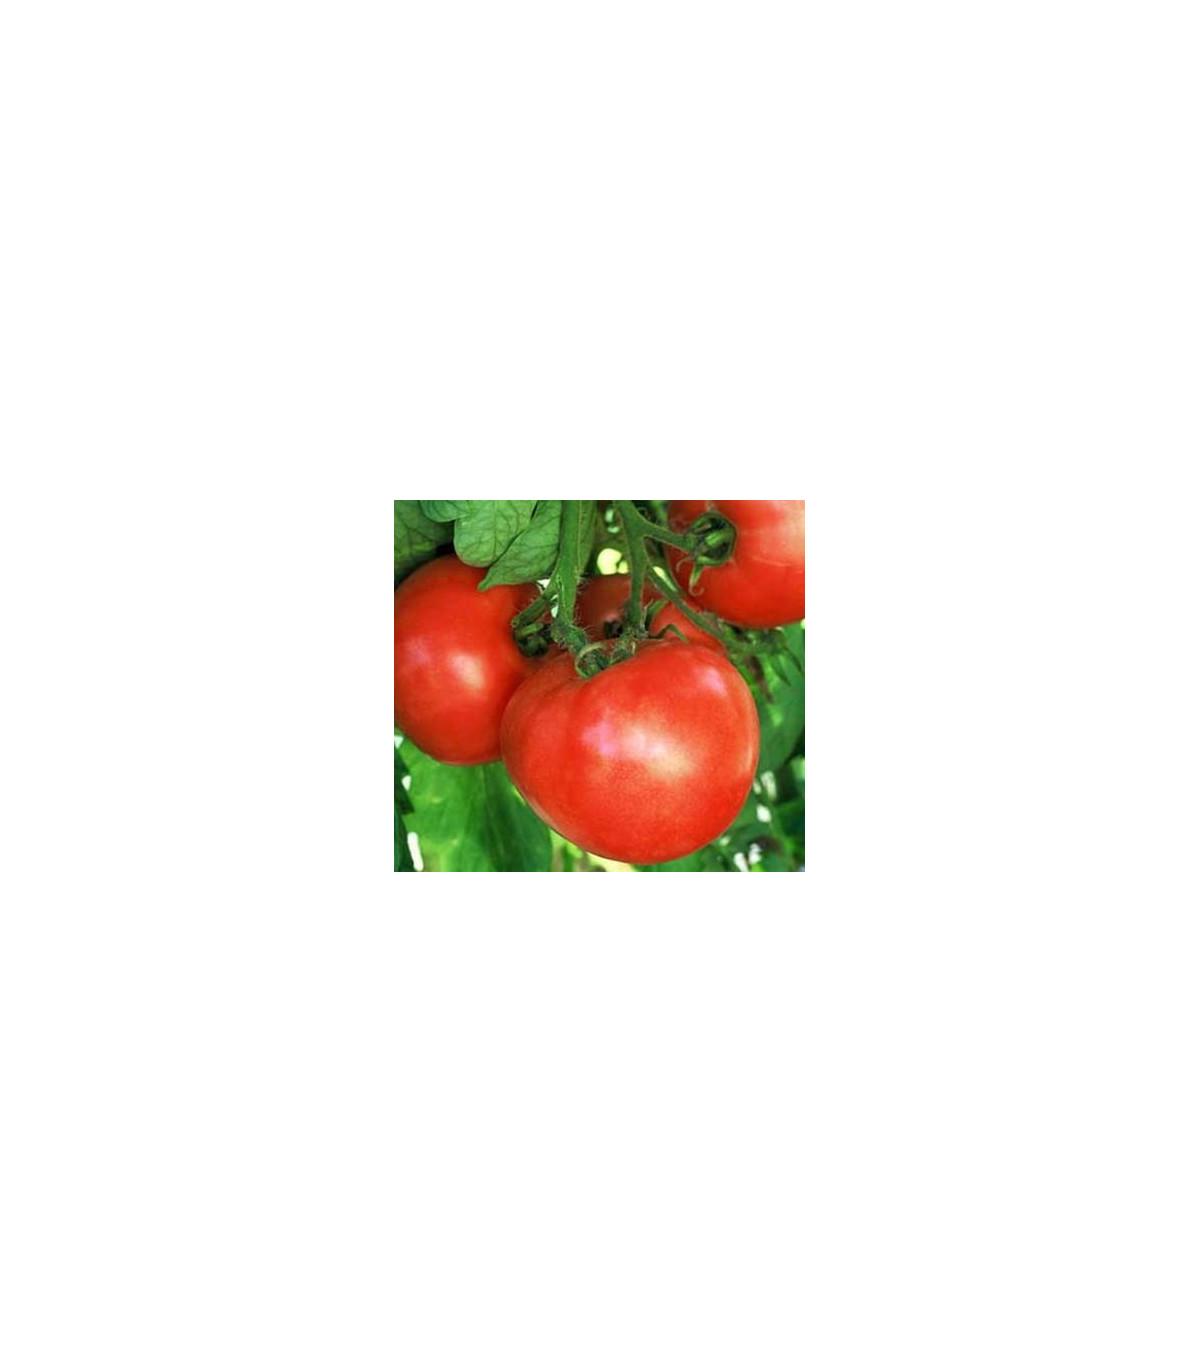 Paradajka ranný zázrak - semená paradajok - 6 ks